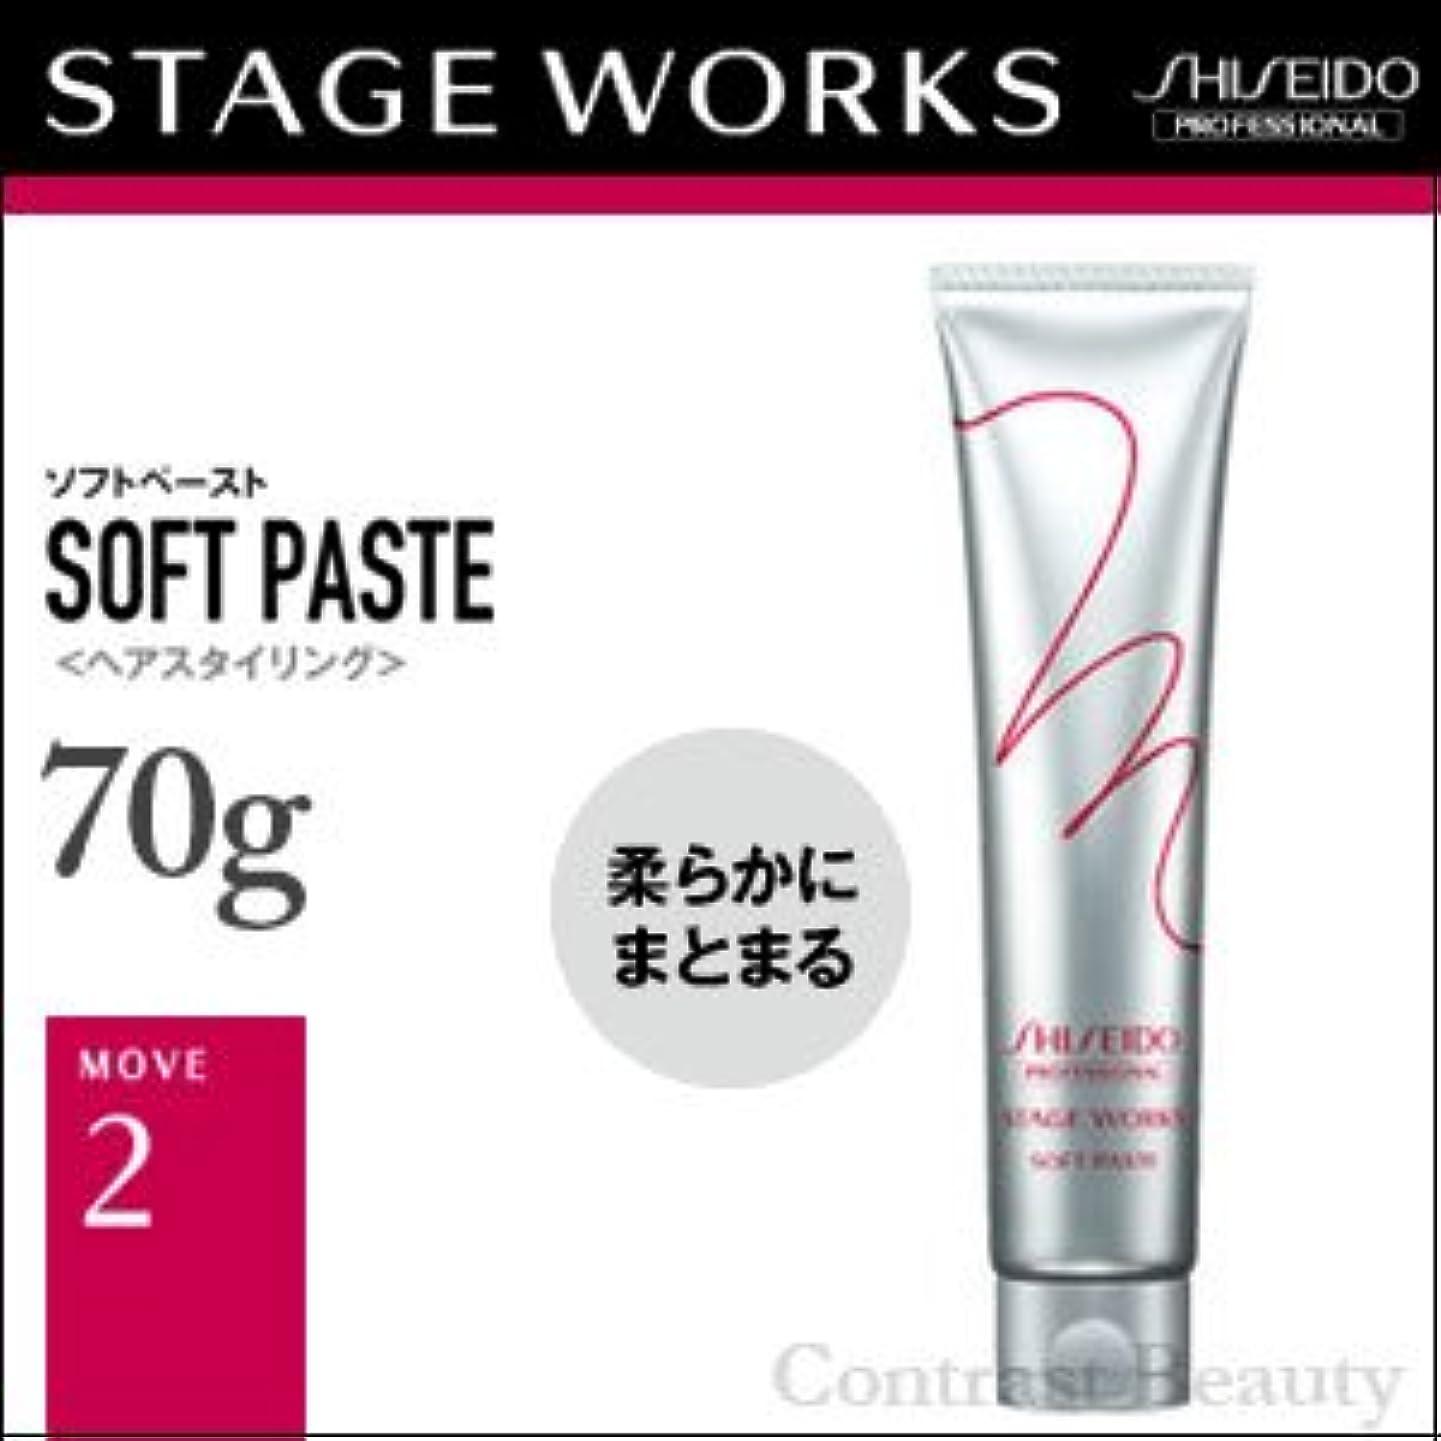 【x3個セット】 資生堂 ステージワークス ムーブ2 ソフトペースト 70g